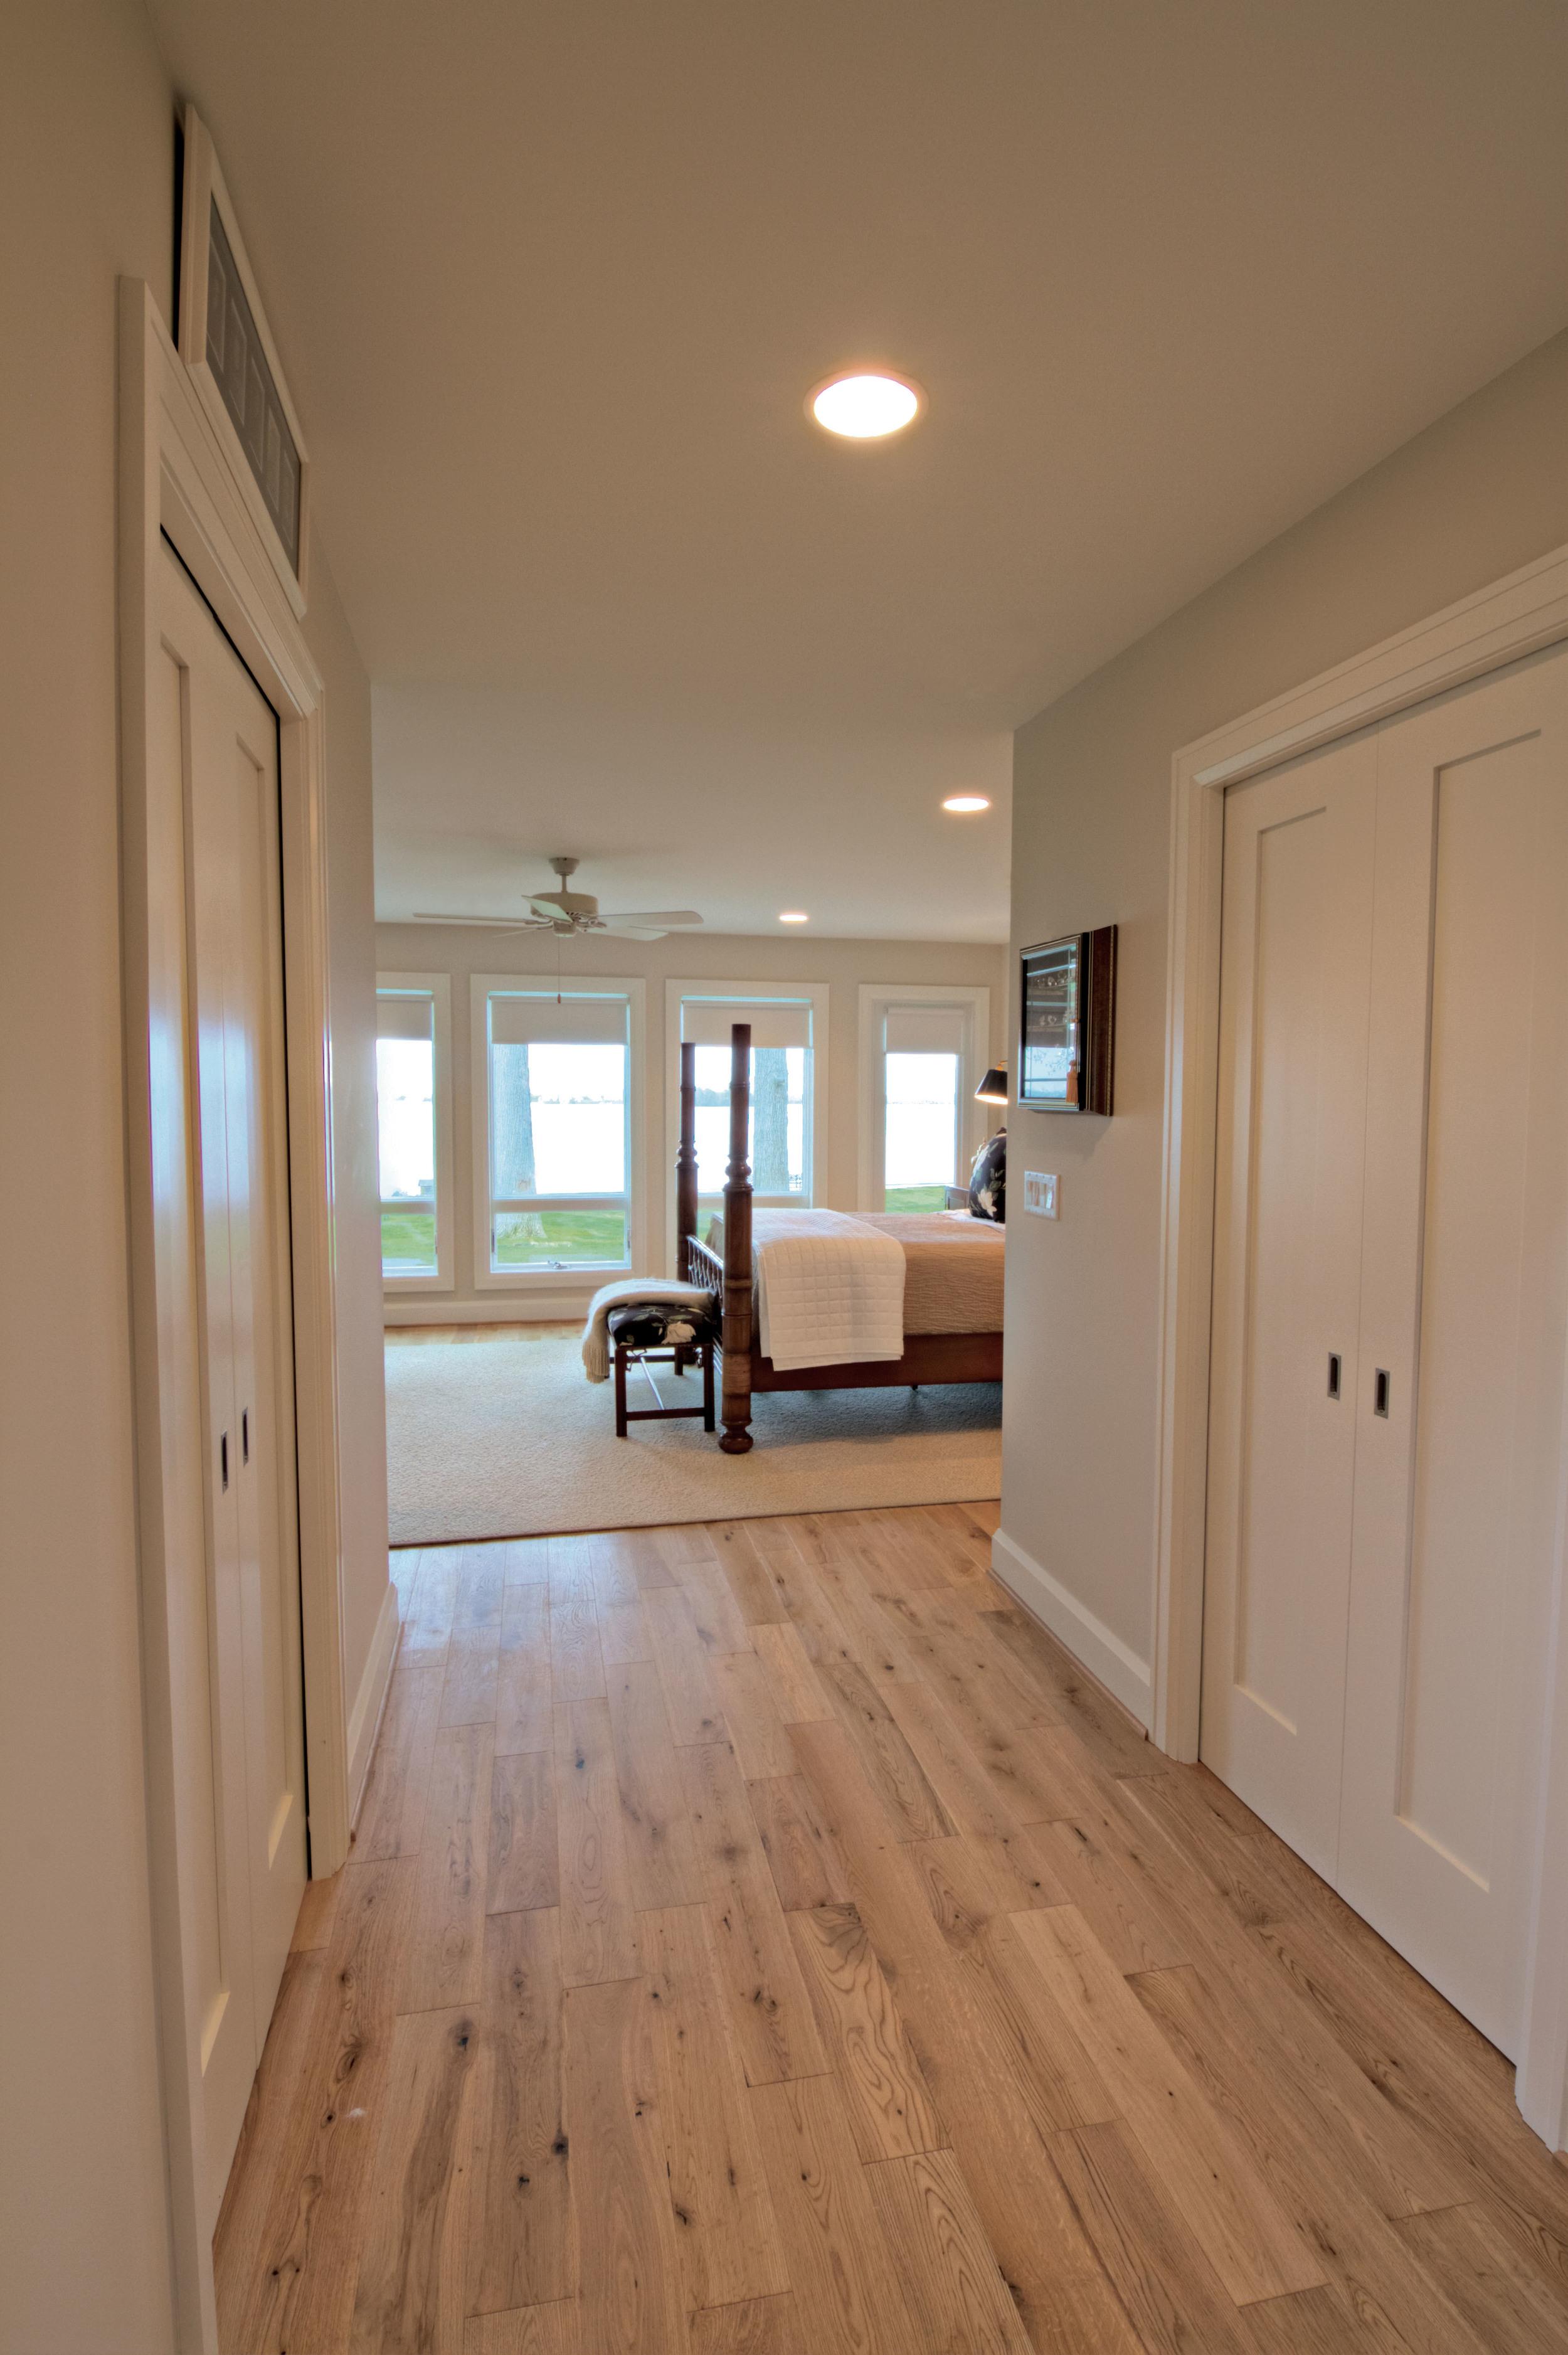 8_B north bedroom Hallway HDR.jpg